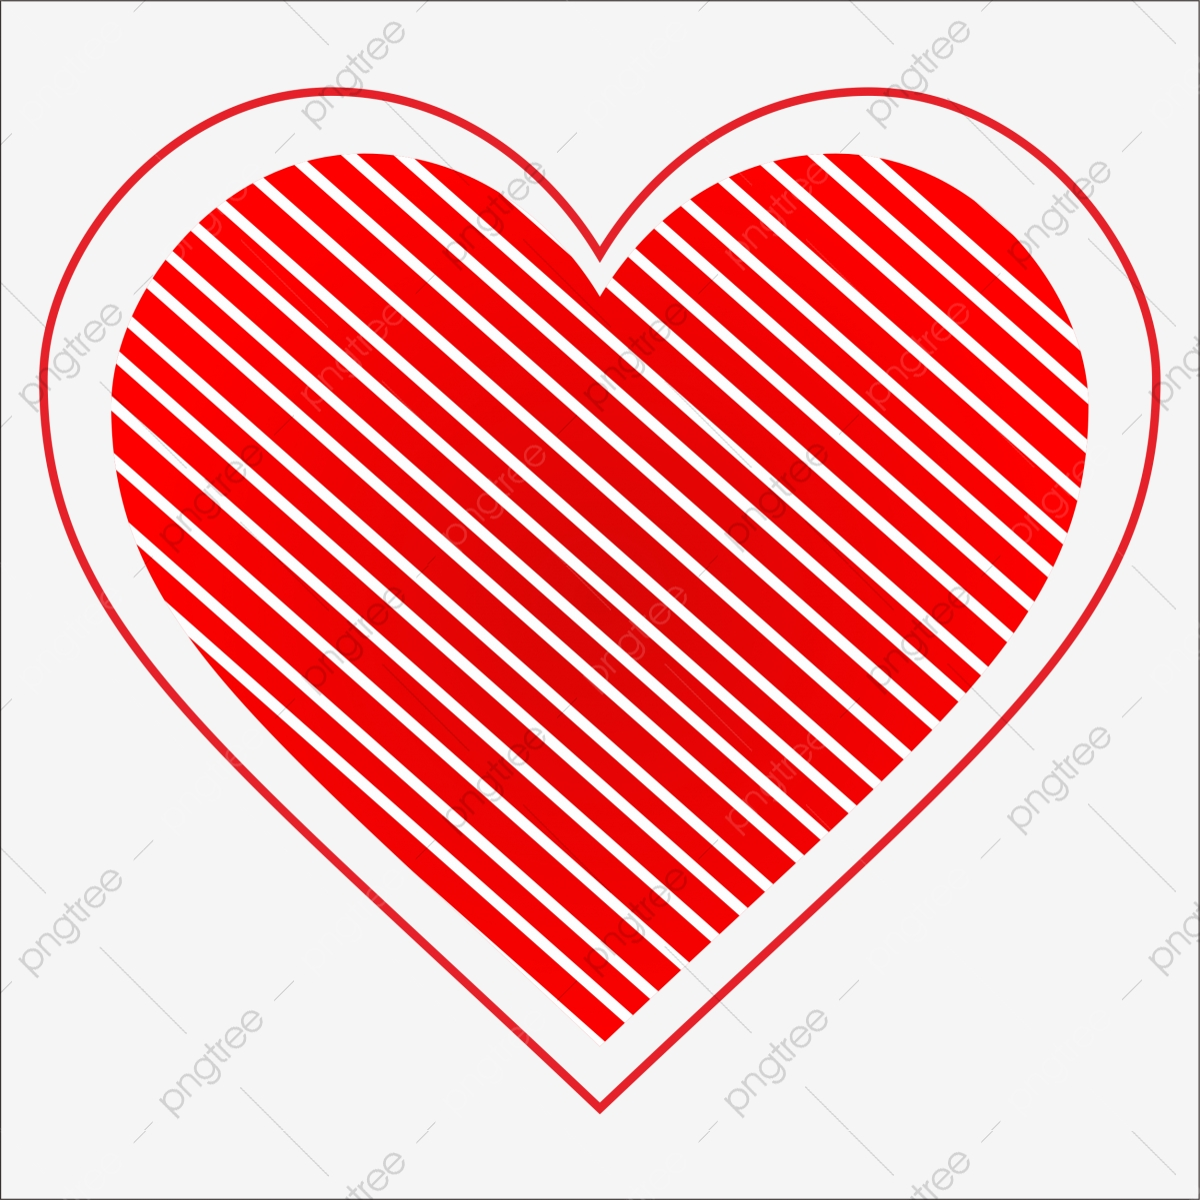 Dibujo Lineal Amor Rojo Amor Ilustracion Dibujos Animados Dibujo